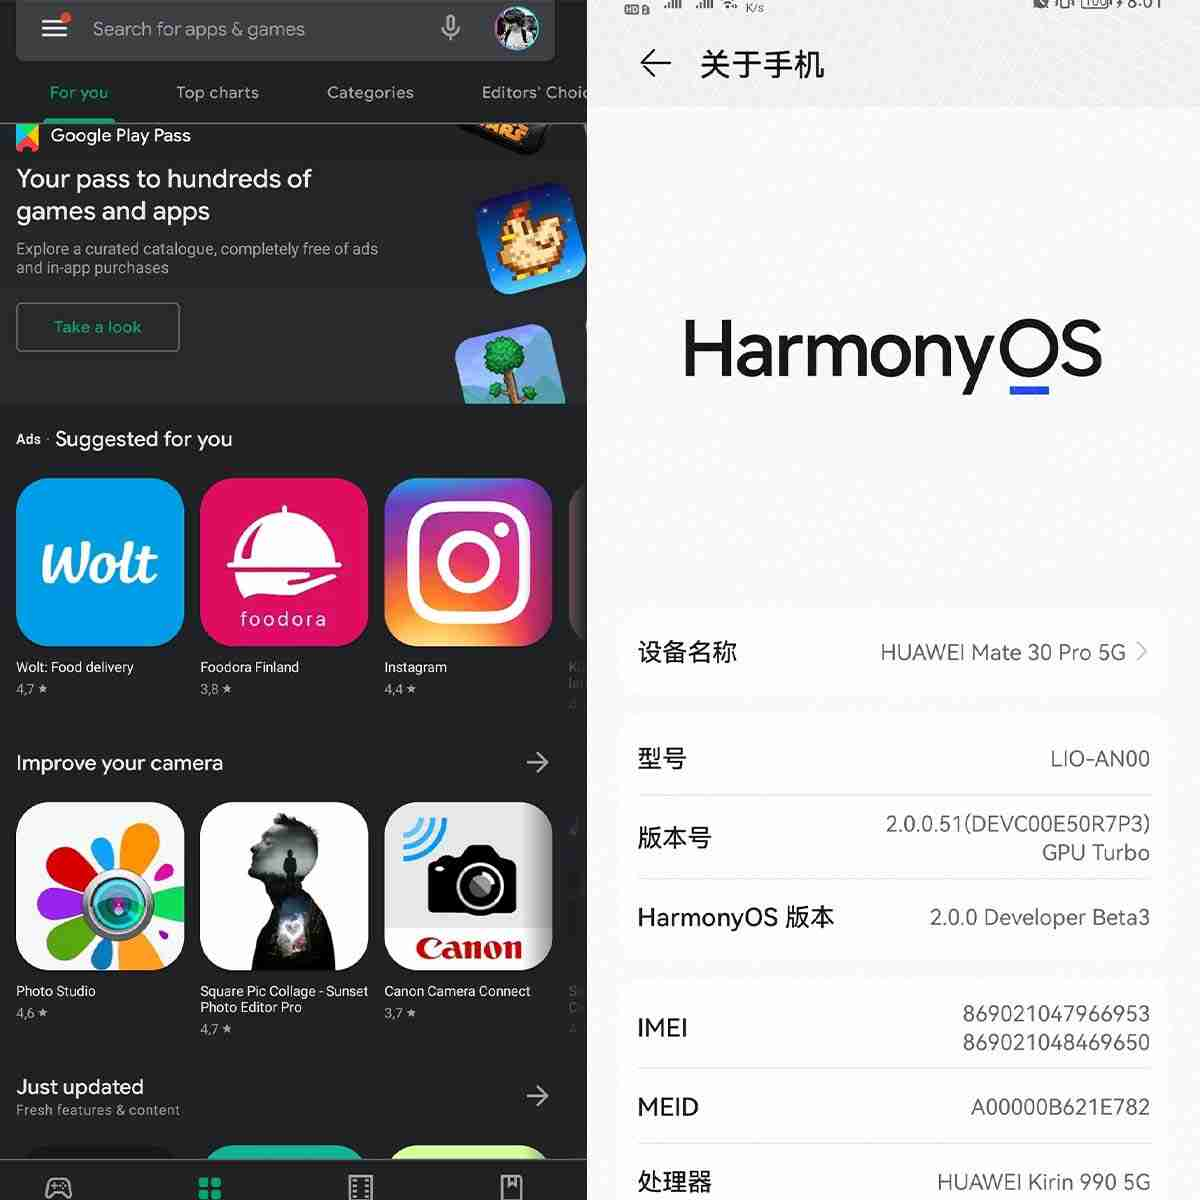 huawei harmonyos 2 beta immagini android 30/4